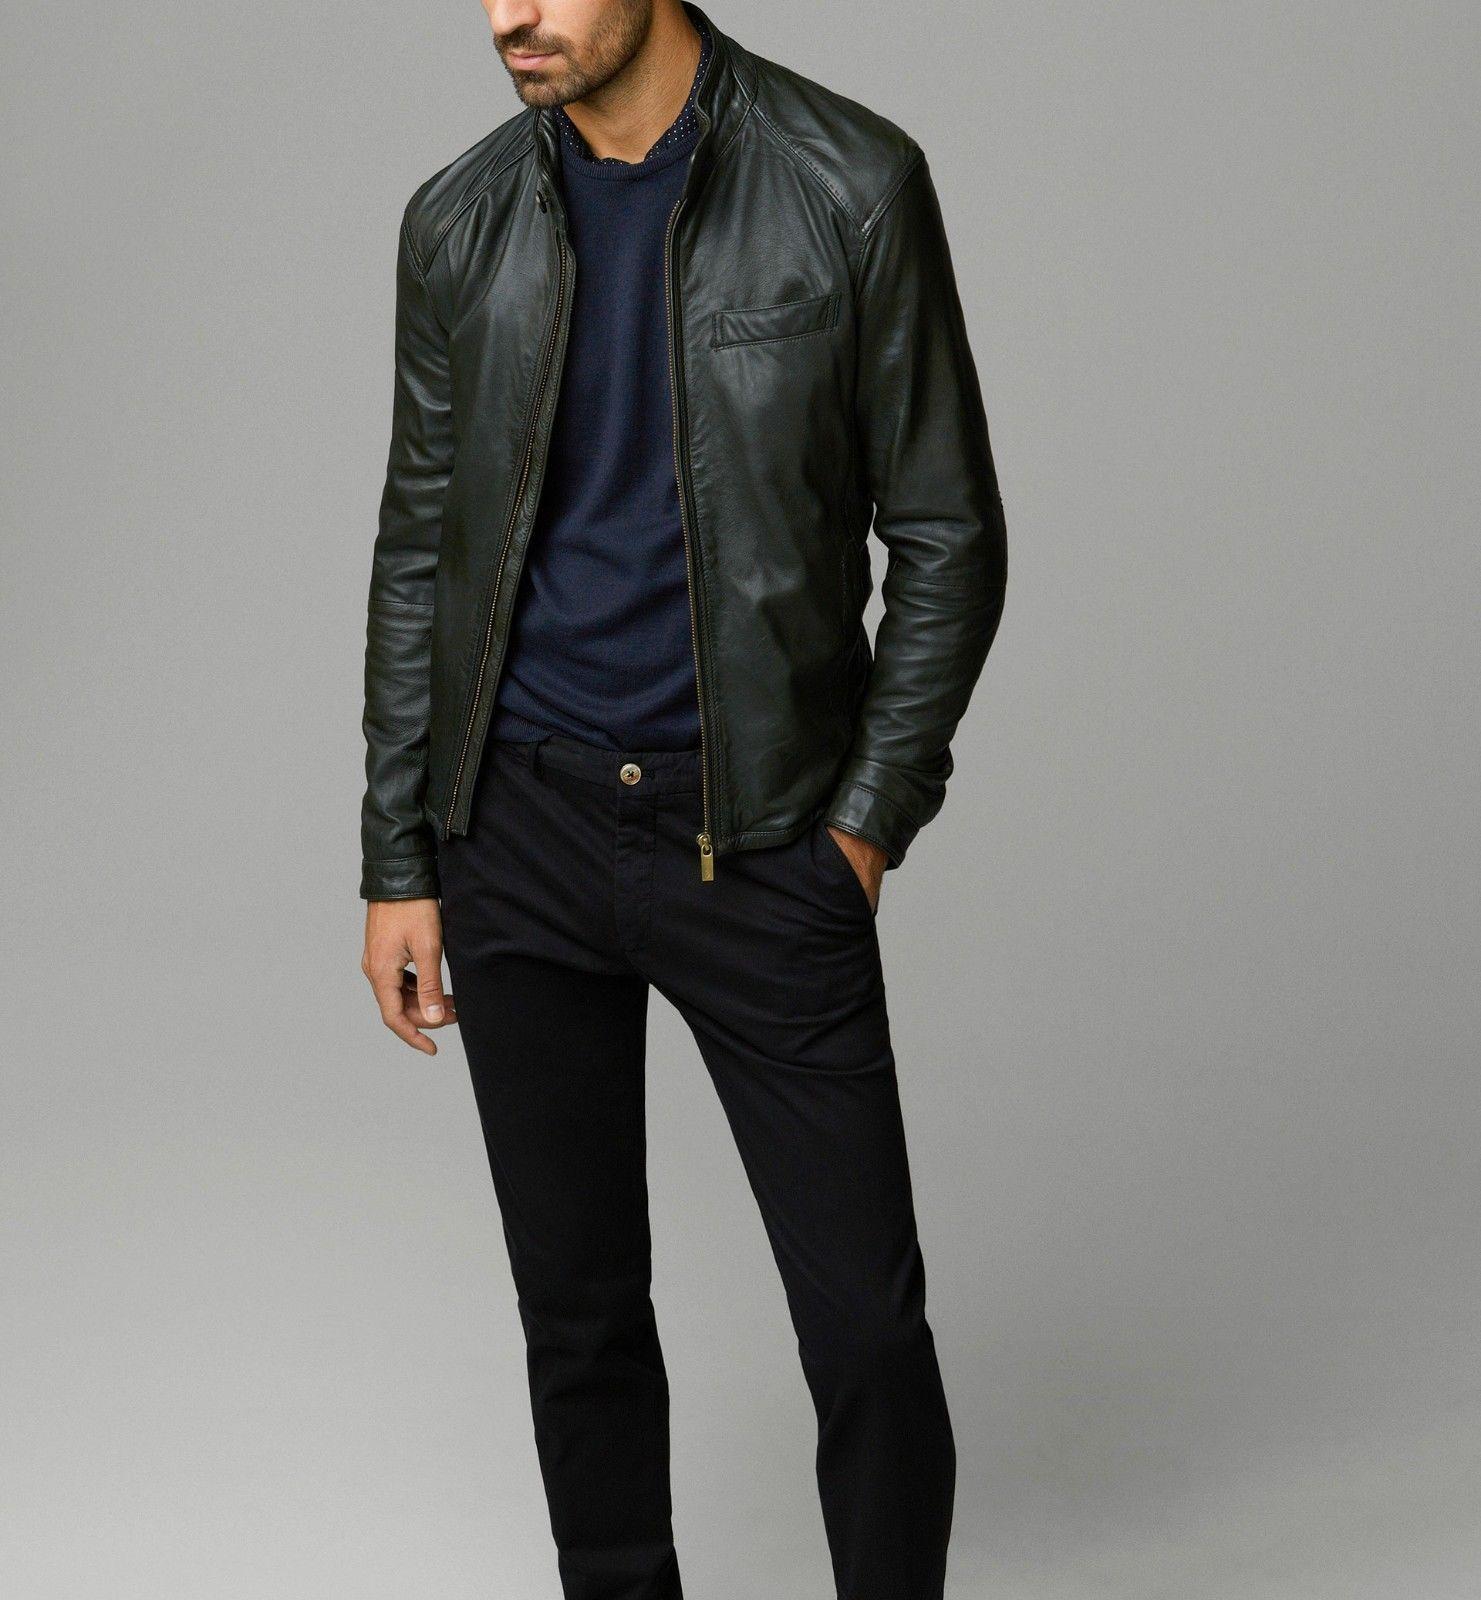 Massimo Dutti Men S Nappa Leather Jacket With Mandarin Collar Season July 2014 Ebay Casual Leather Jacket Leather Jacket Style Green Leather Jackets [ 1600 x 1481 Pixel ]